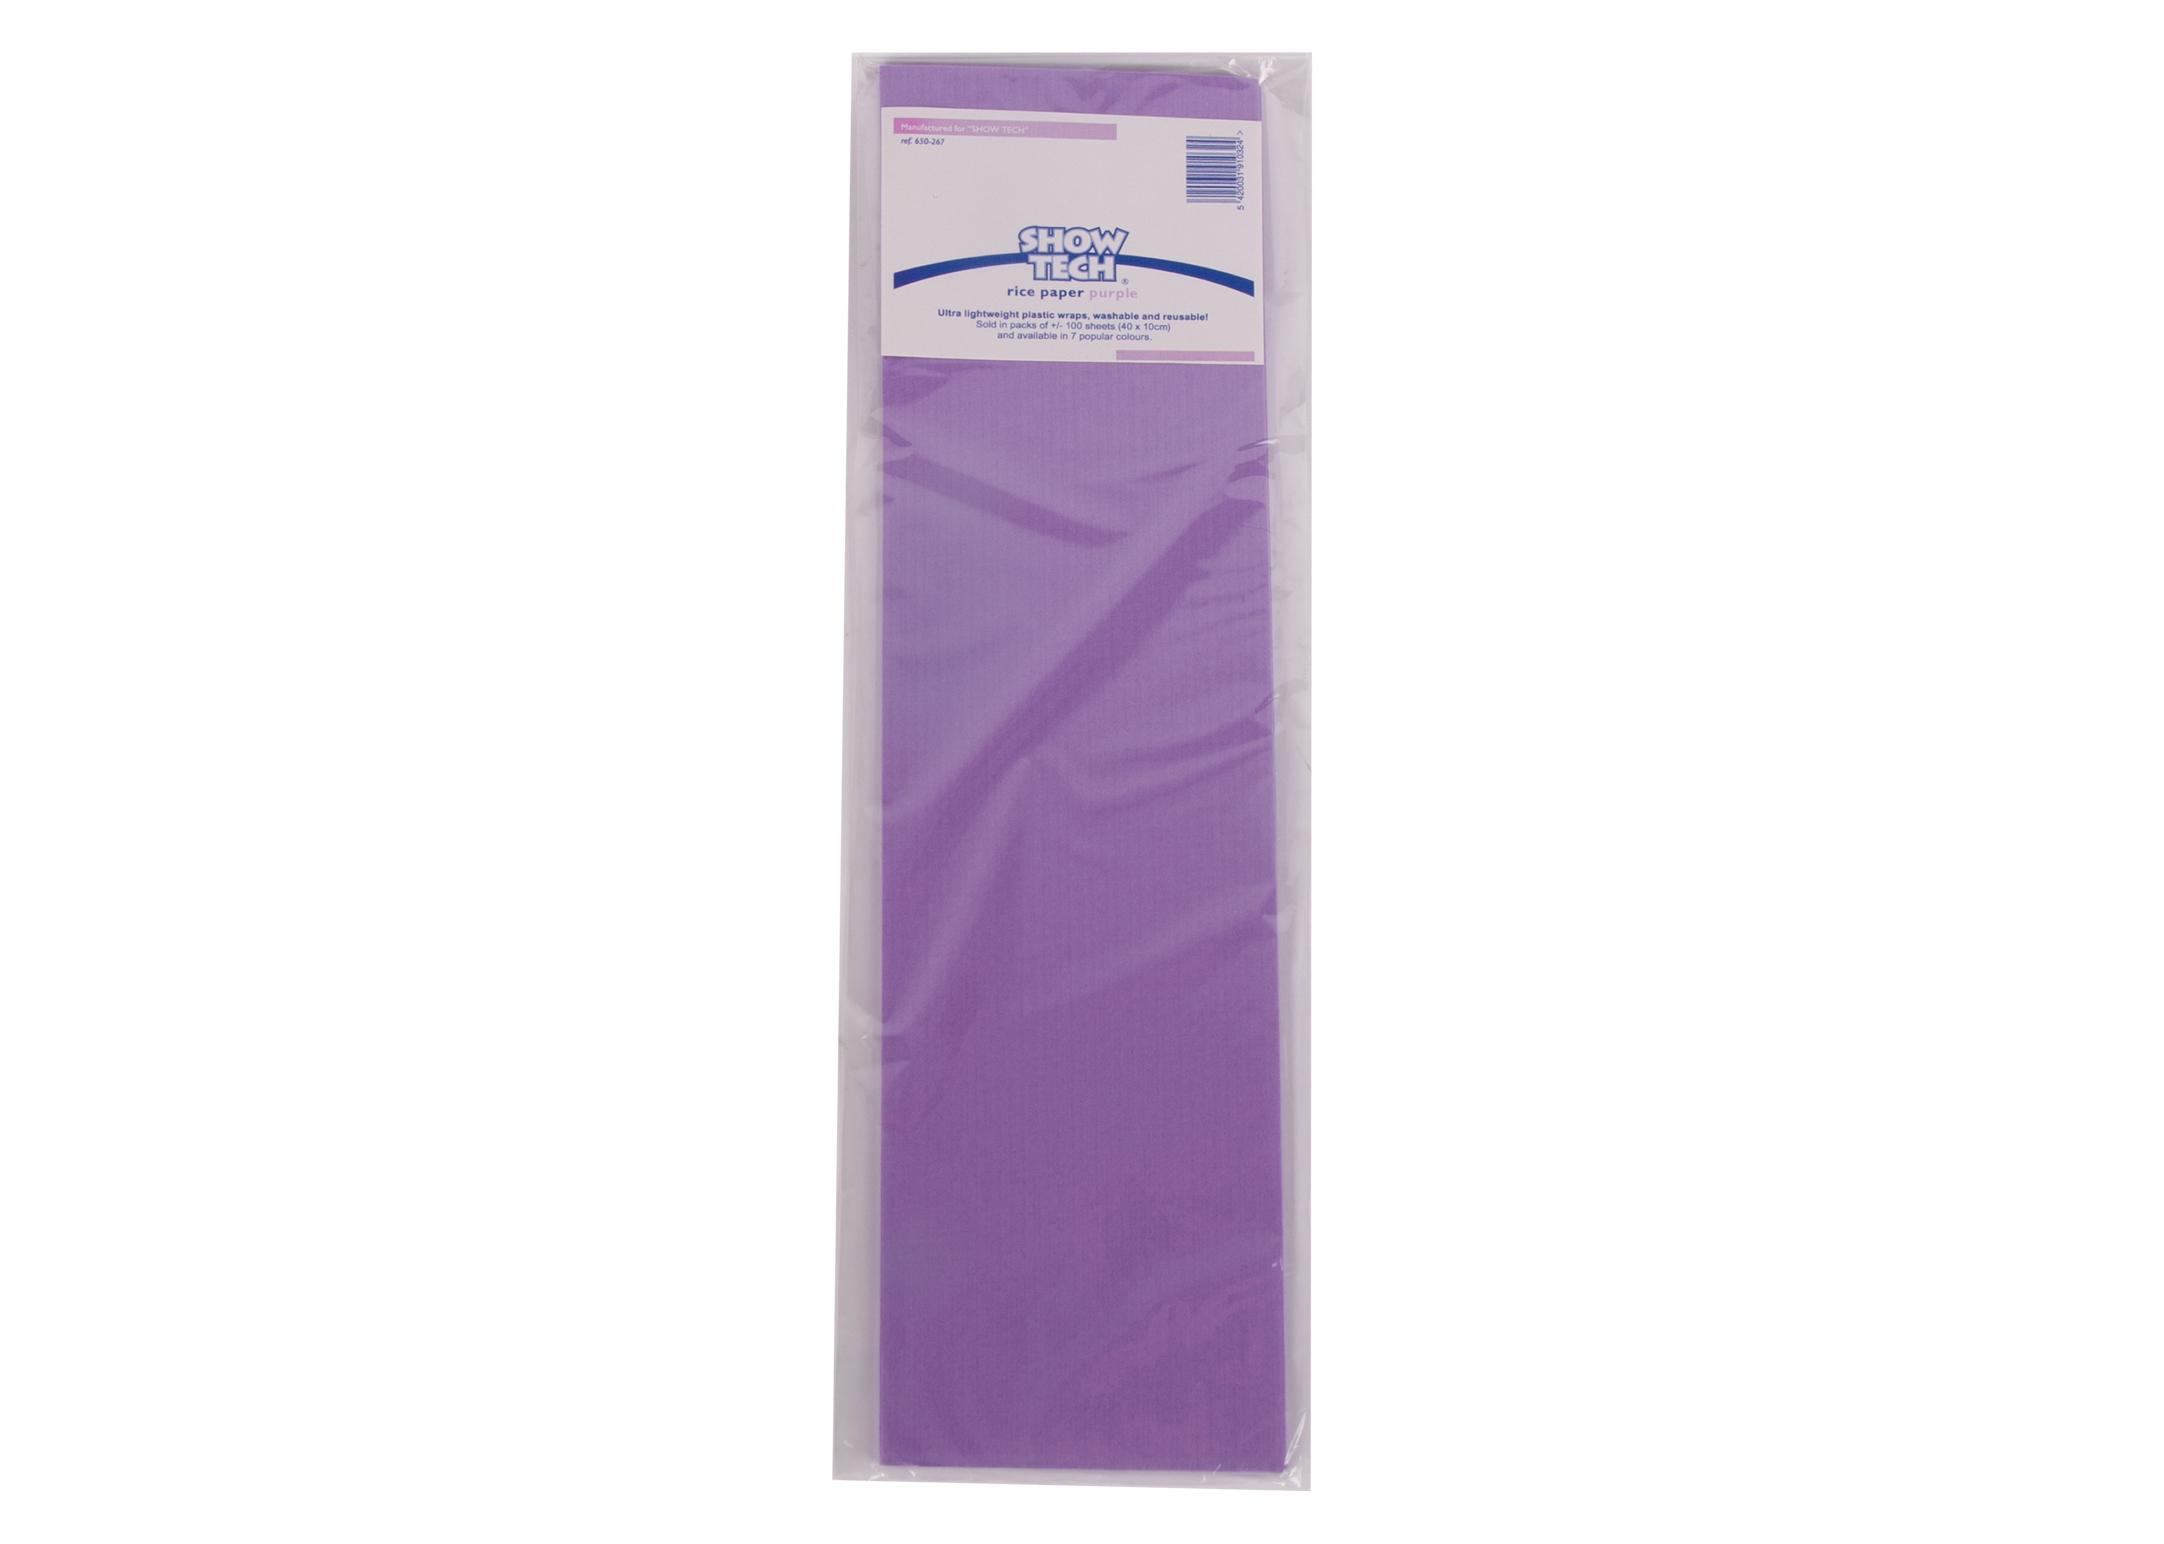 Show Tech Rice Paper Purple 100 pcs Wrapping Paper